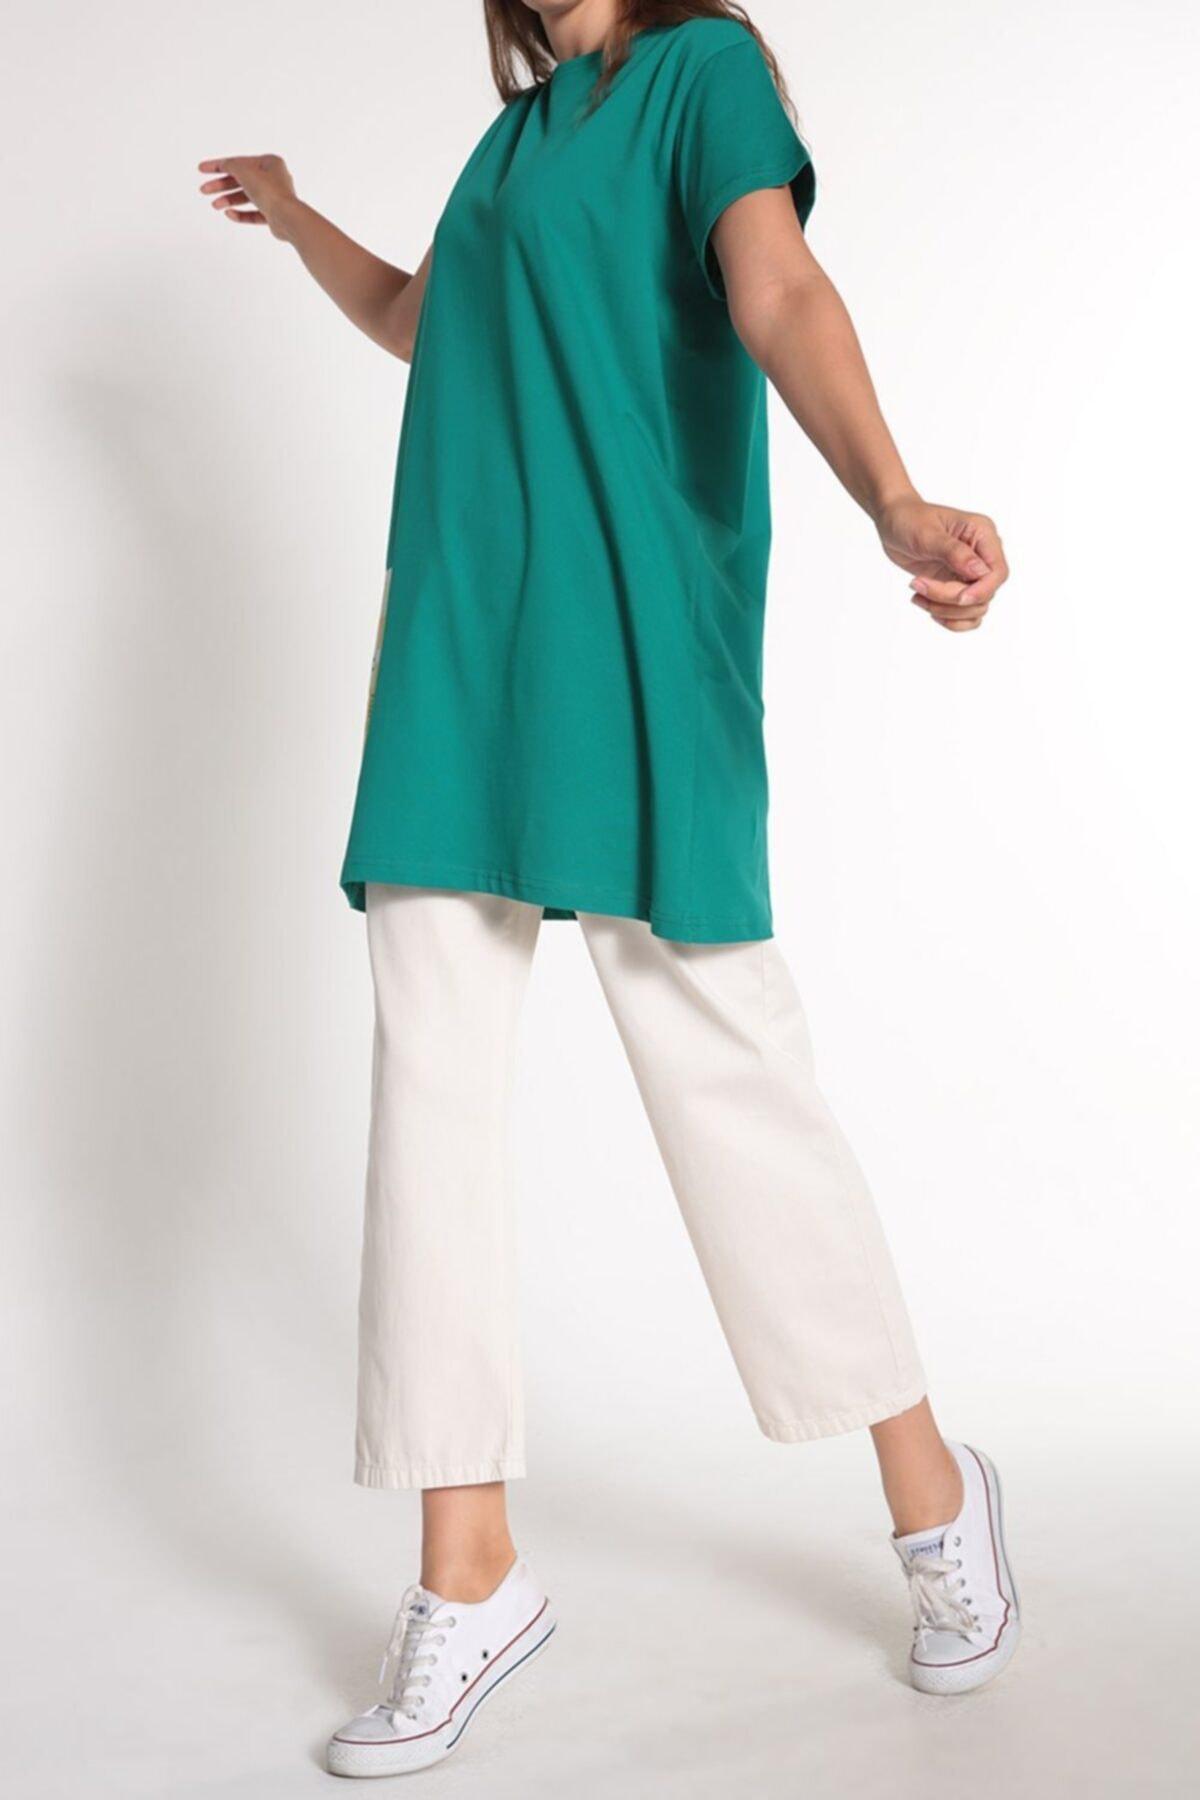 ALLDAY Zümrüt Yeşili Kısa Kol Baskılı T-shirt 1